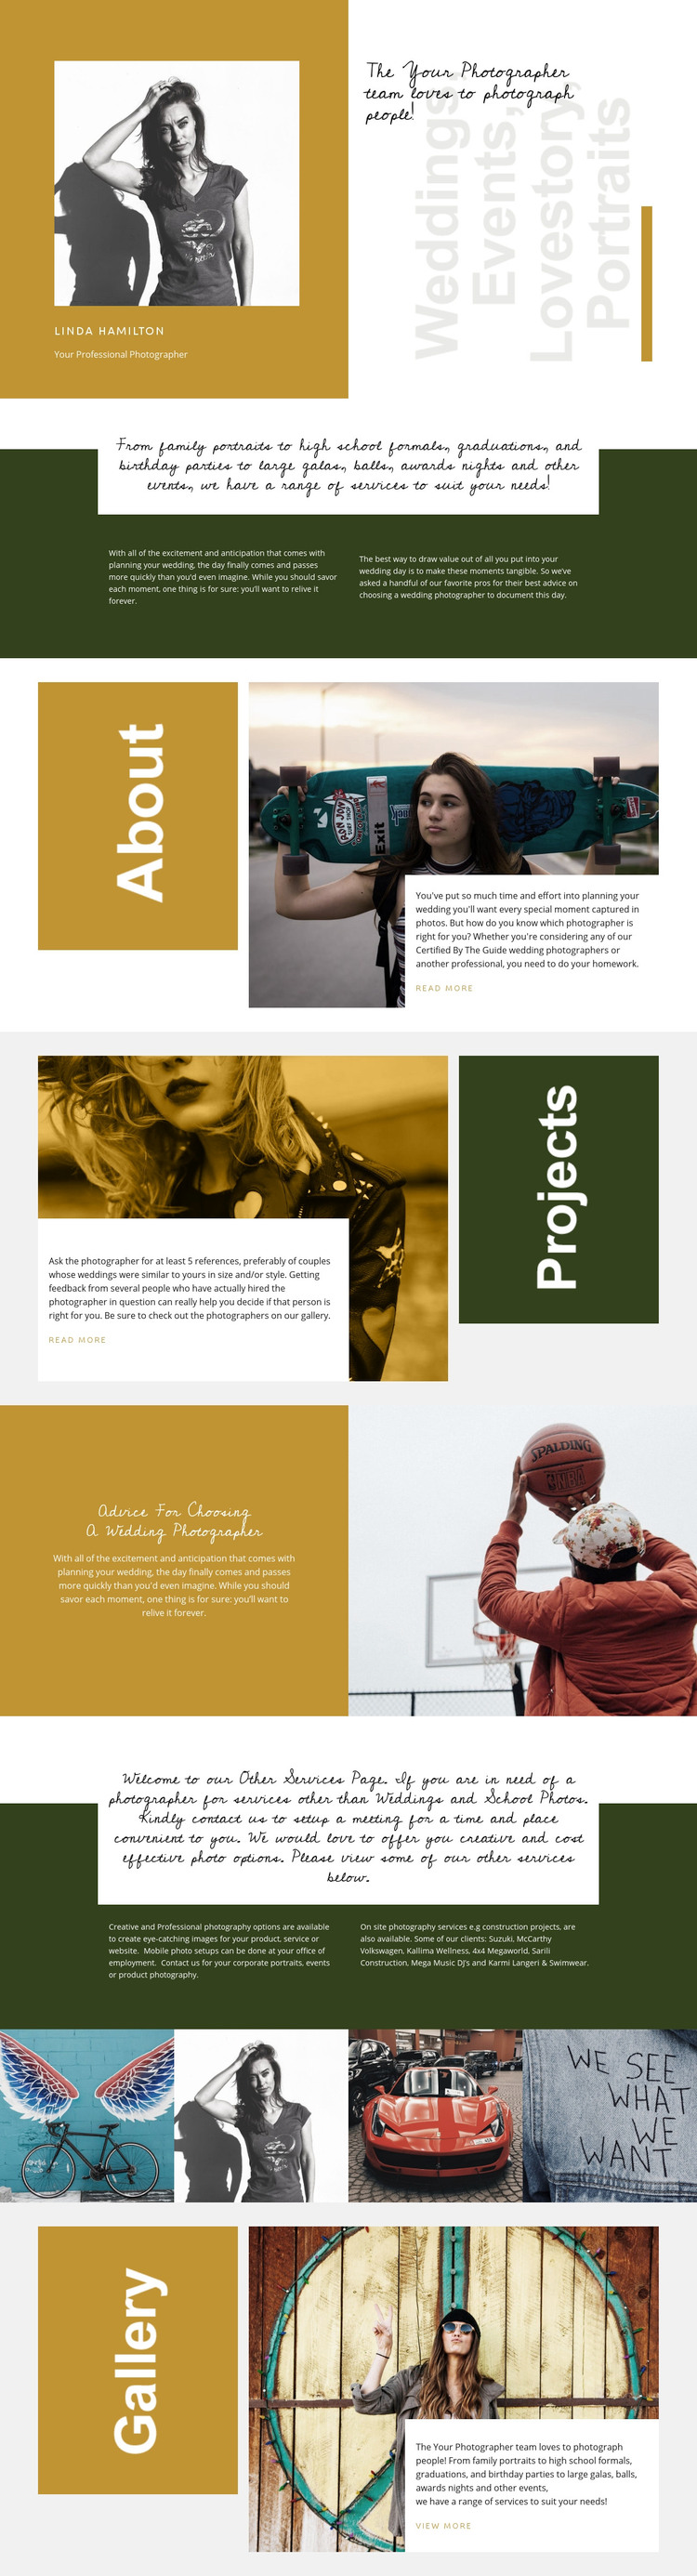 Fashion photography courses WordPress Website